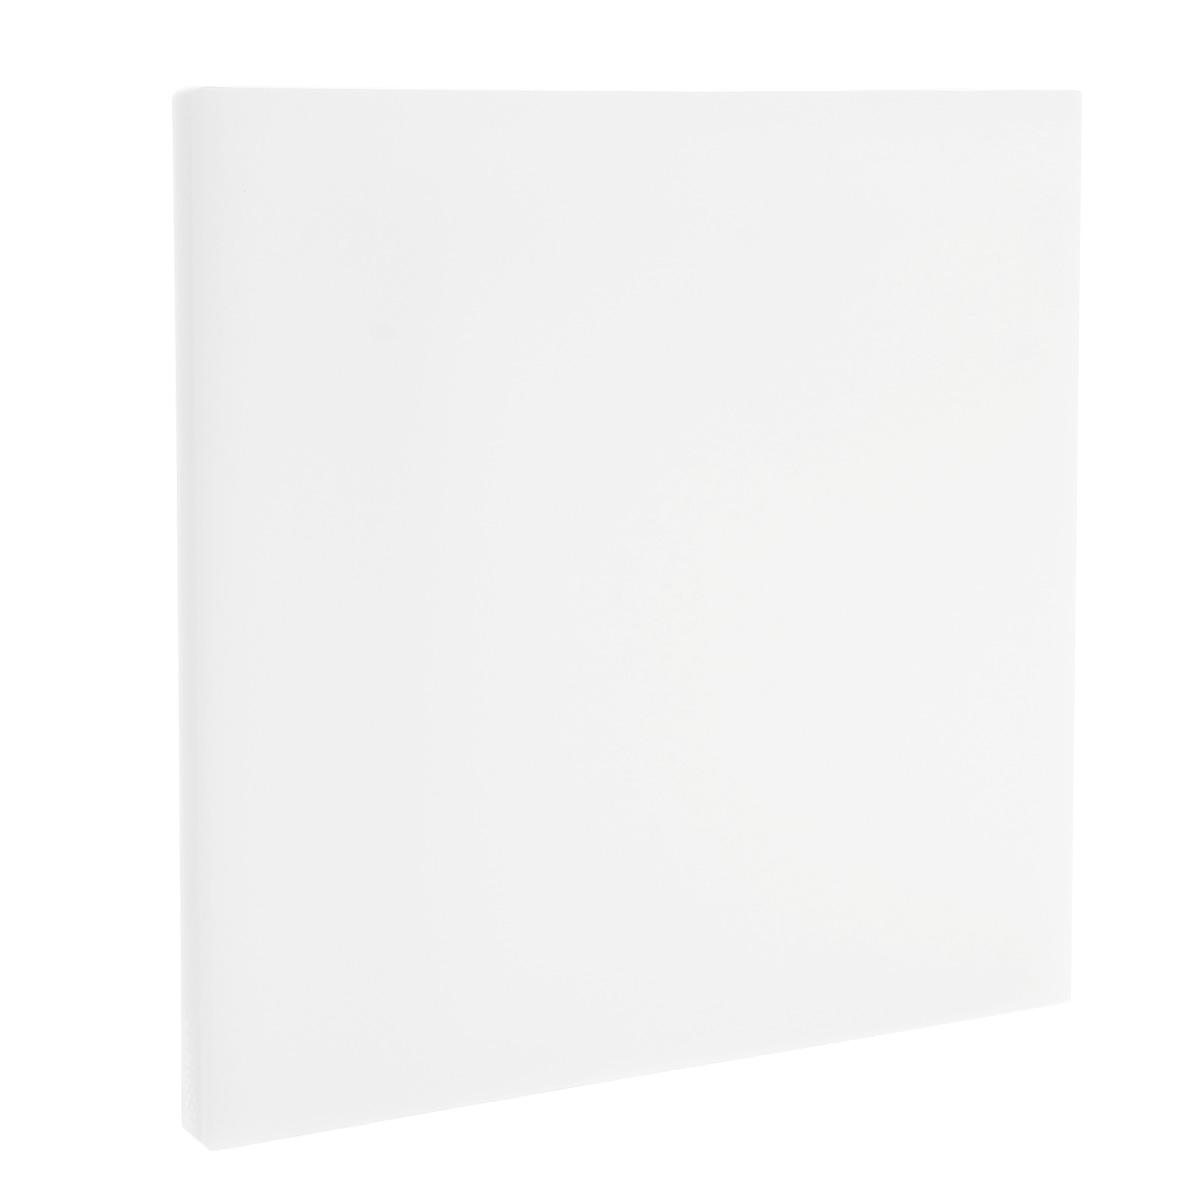 Доска разделочная Zanussi, цвет: белый, 35 см х 35 см